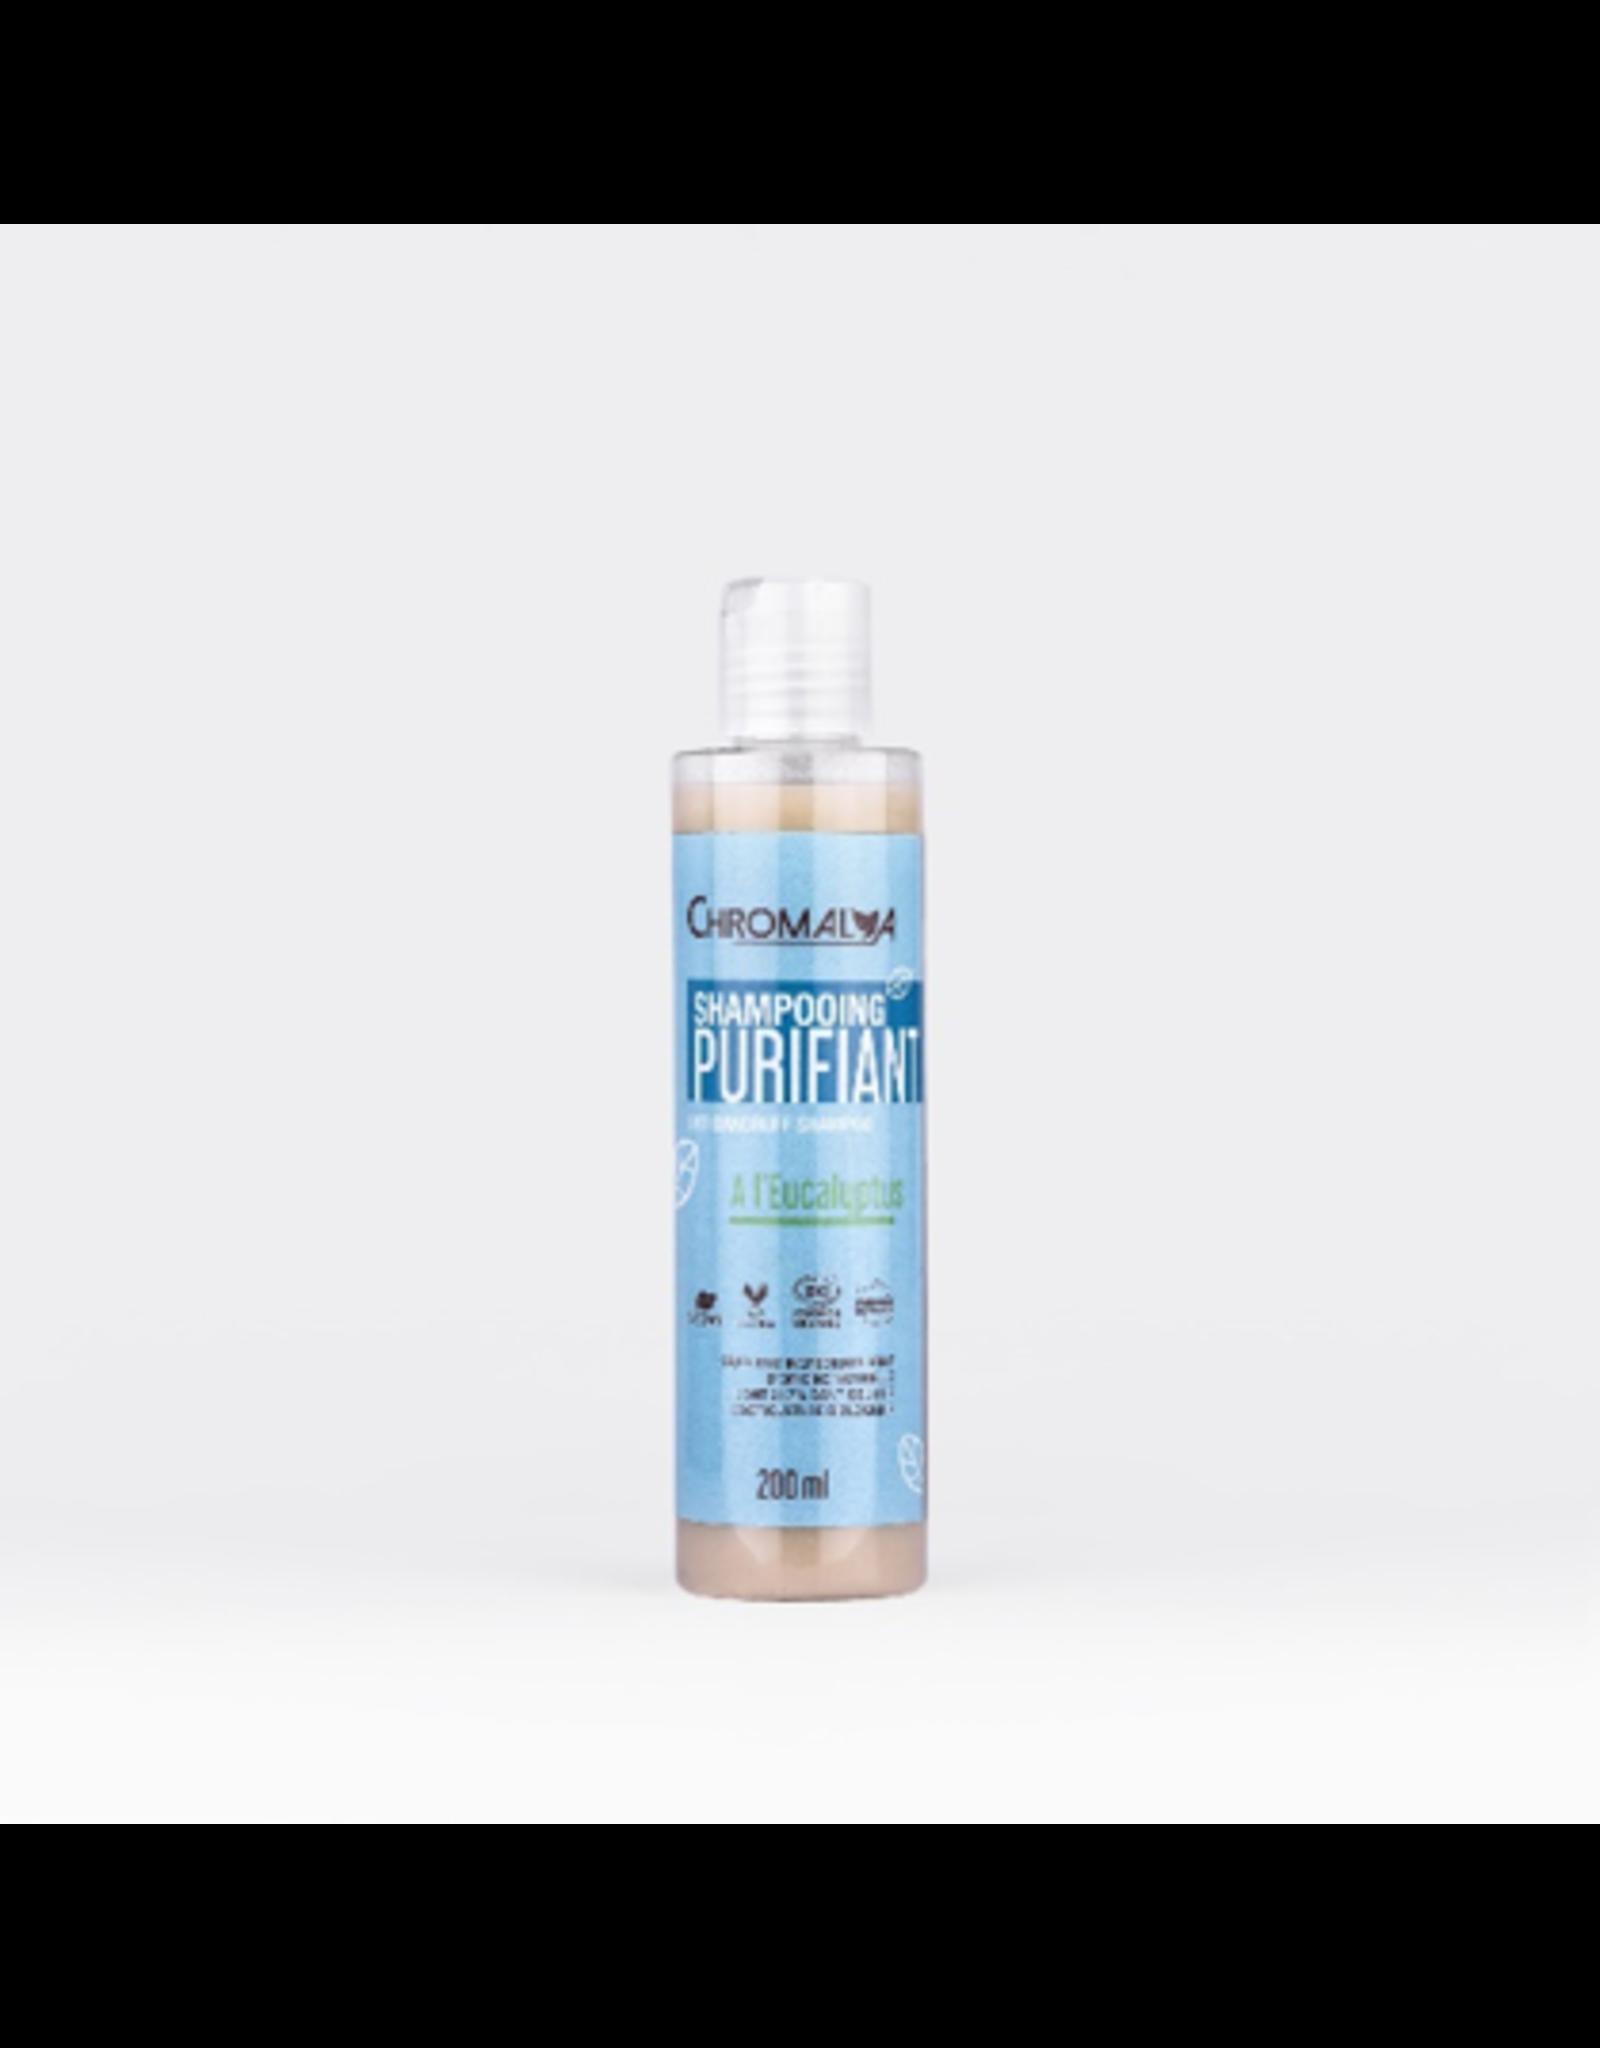 Chromalya Purifian (reinigende) Shampoo